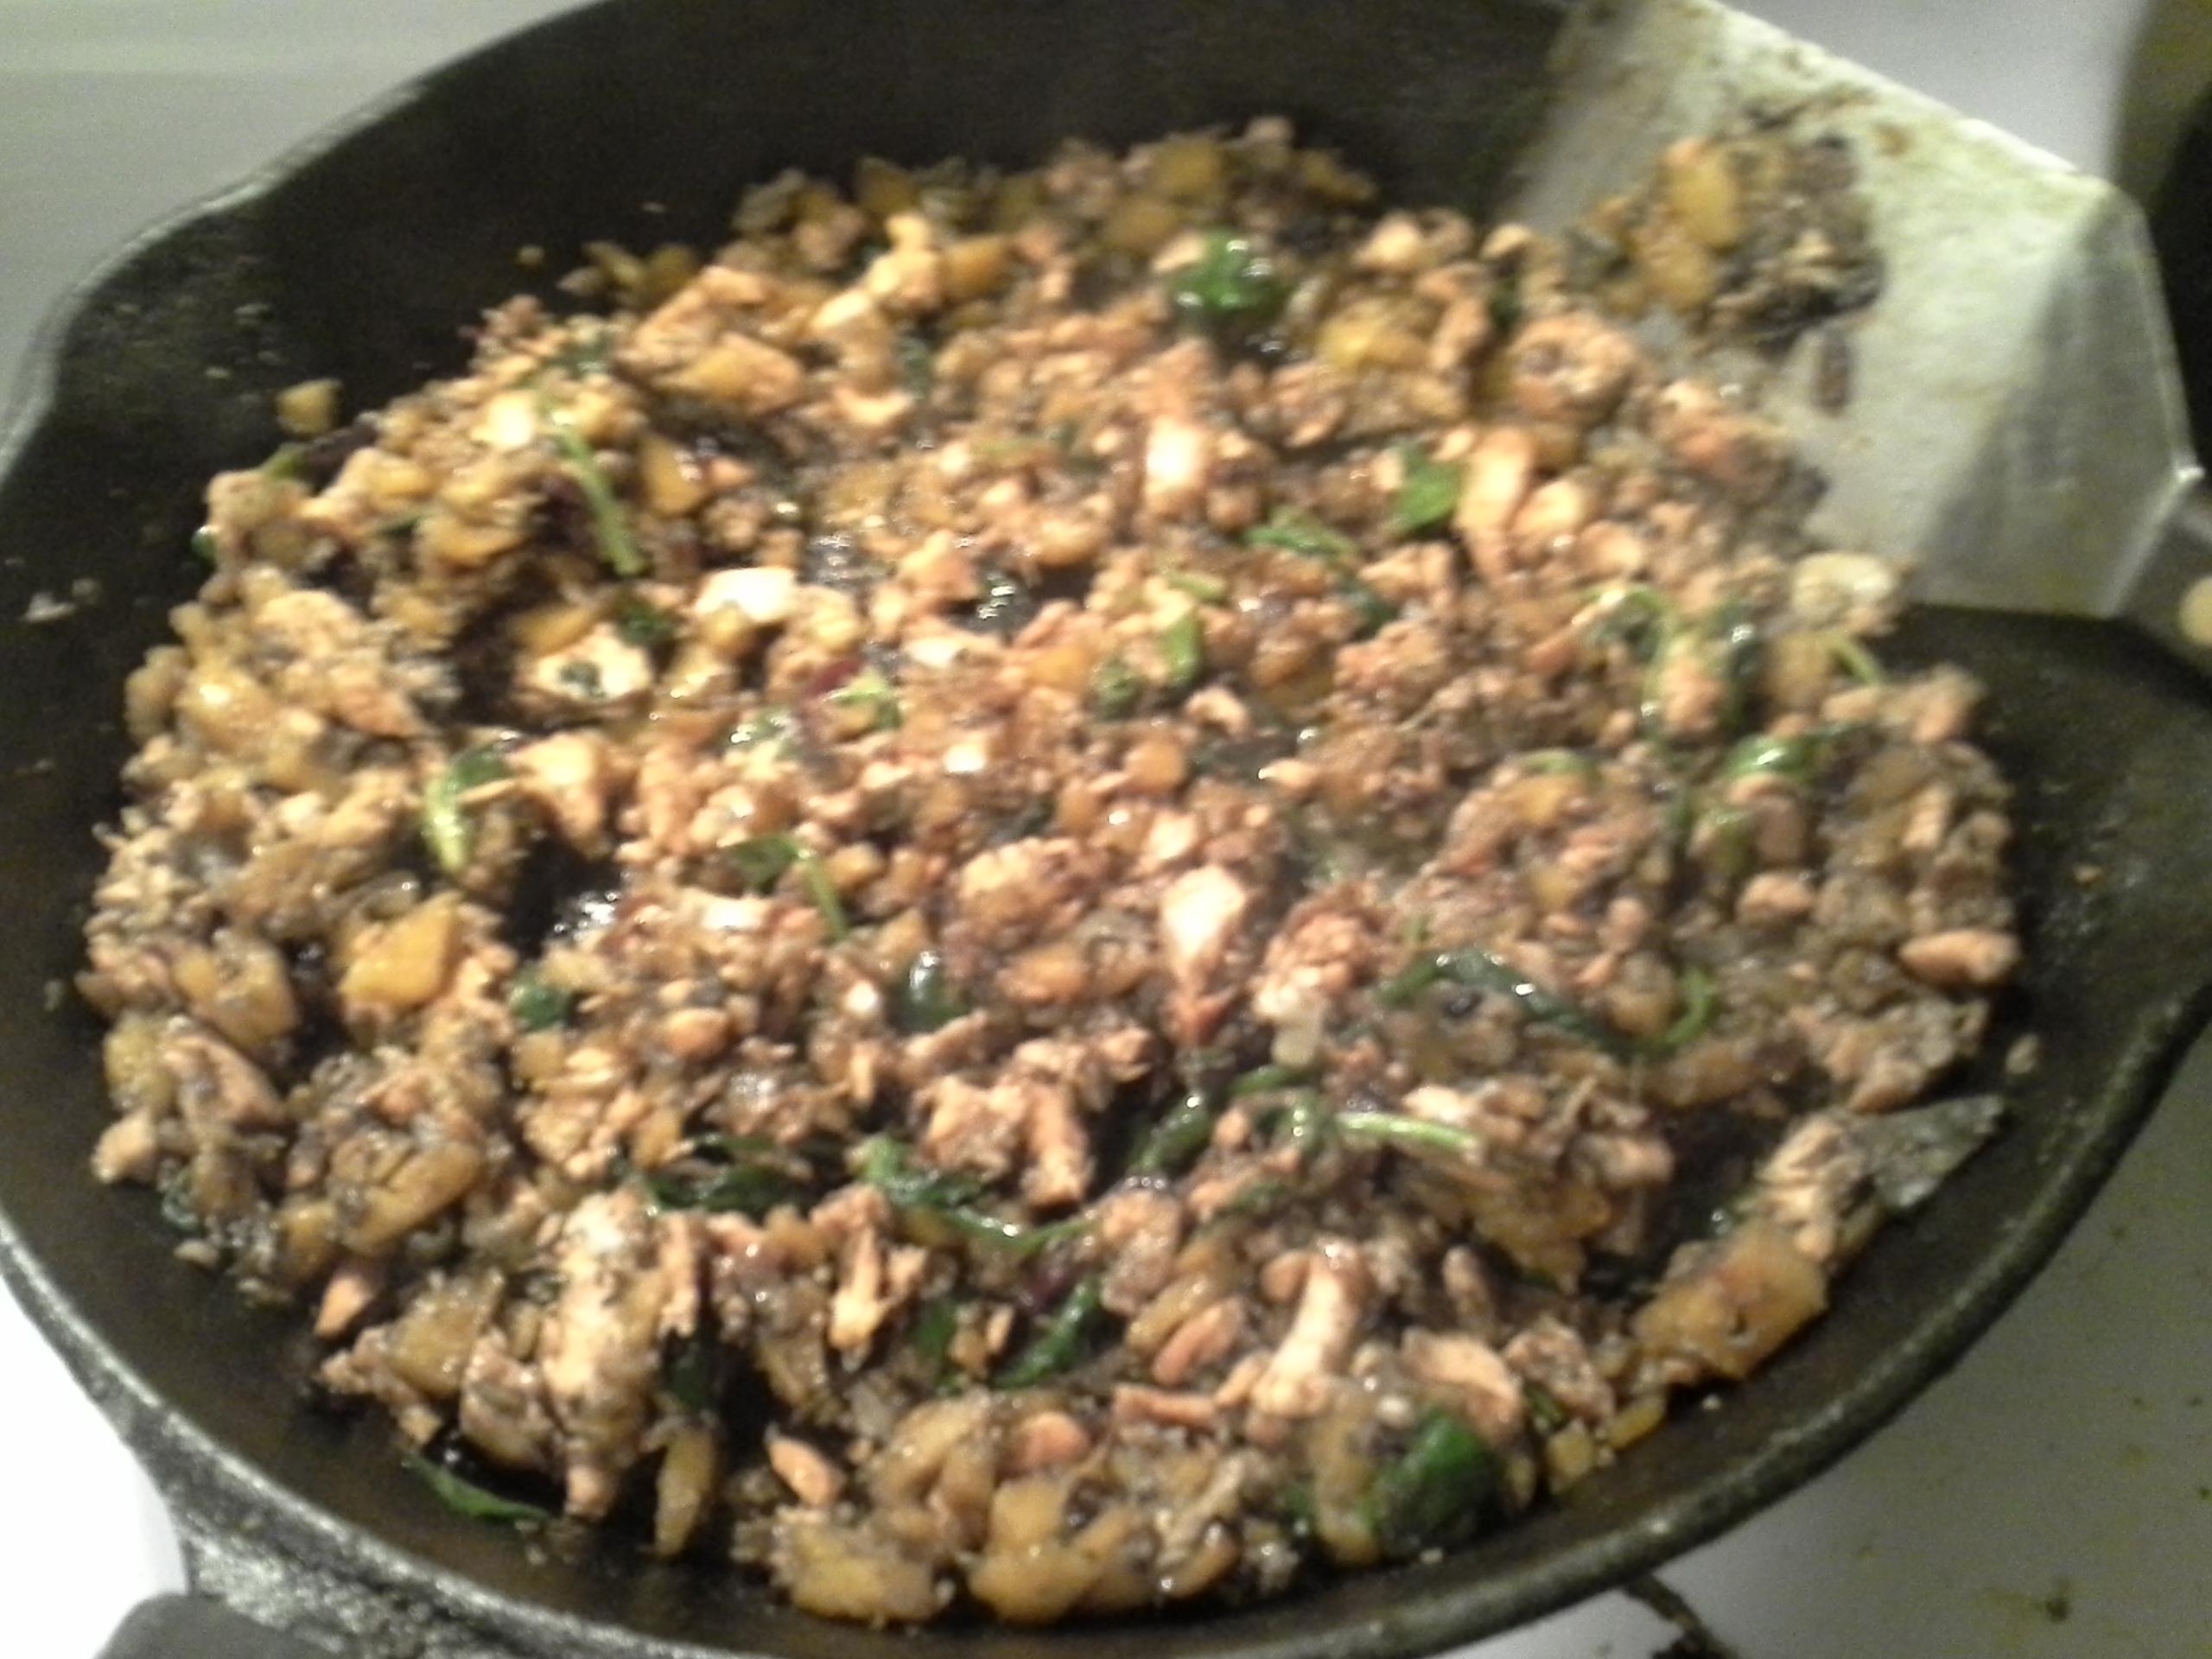 Dinner: 8:35 p.m.   8 oz. salmon, 1/4 butternut squash, 1/2 oz. baby kale/spinach/chard/beet greens mix, 1/2 sweet onion, 4 cloves garlic, 2 Tbsp. coconut oil, herbs & spices